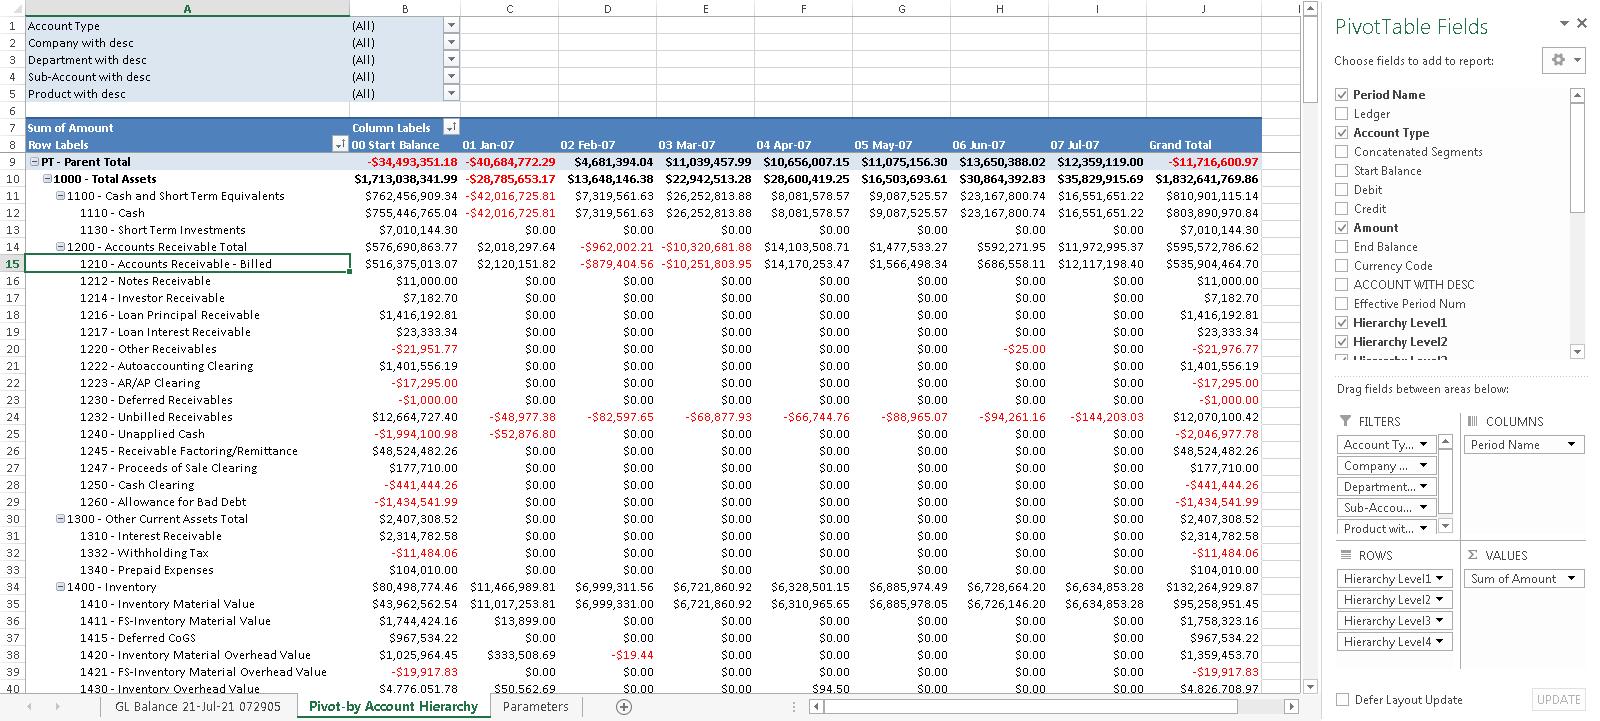 Blitz Report pivot table example